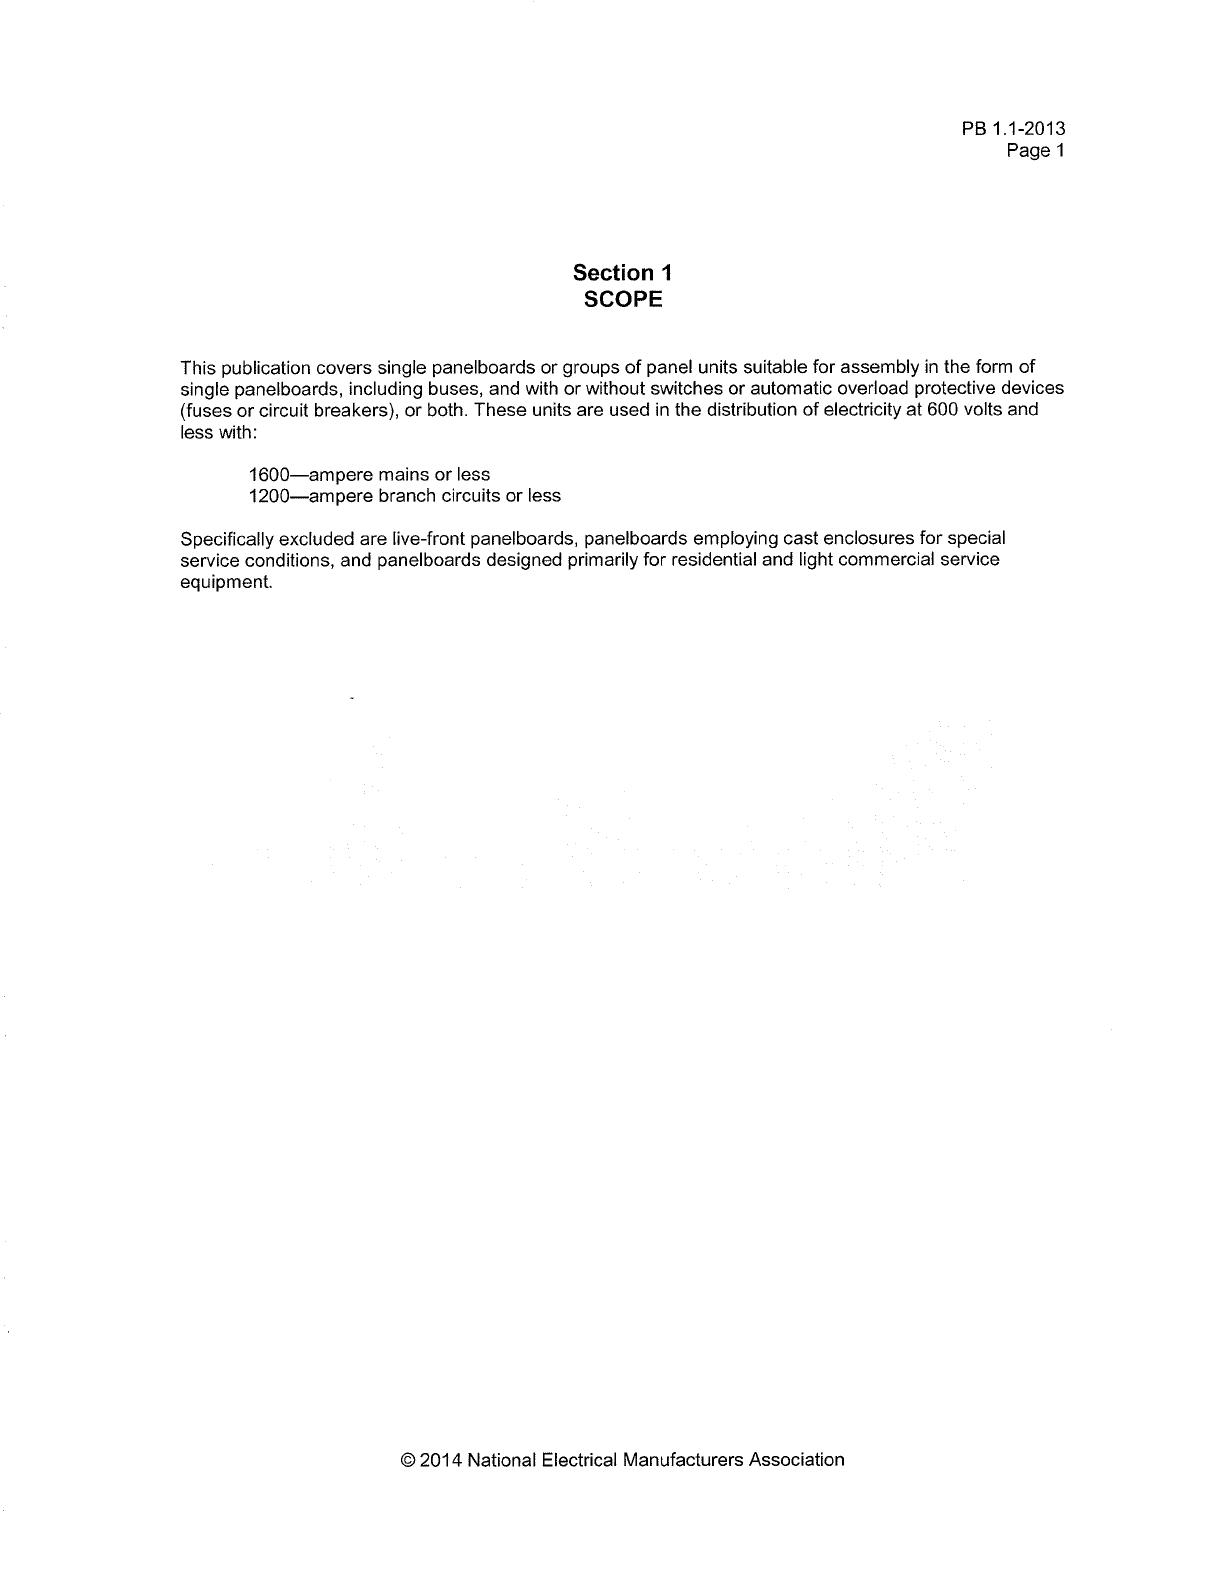 157806 Catalog 1 2002 Mercedes Benz W211 Pre Fuse Power Distribution Wiring Schematic Diagram Instruction Data